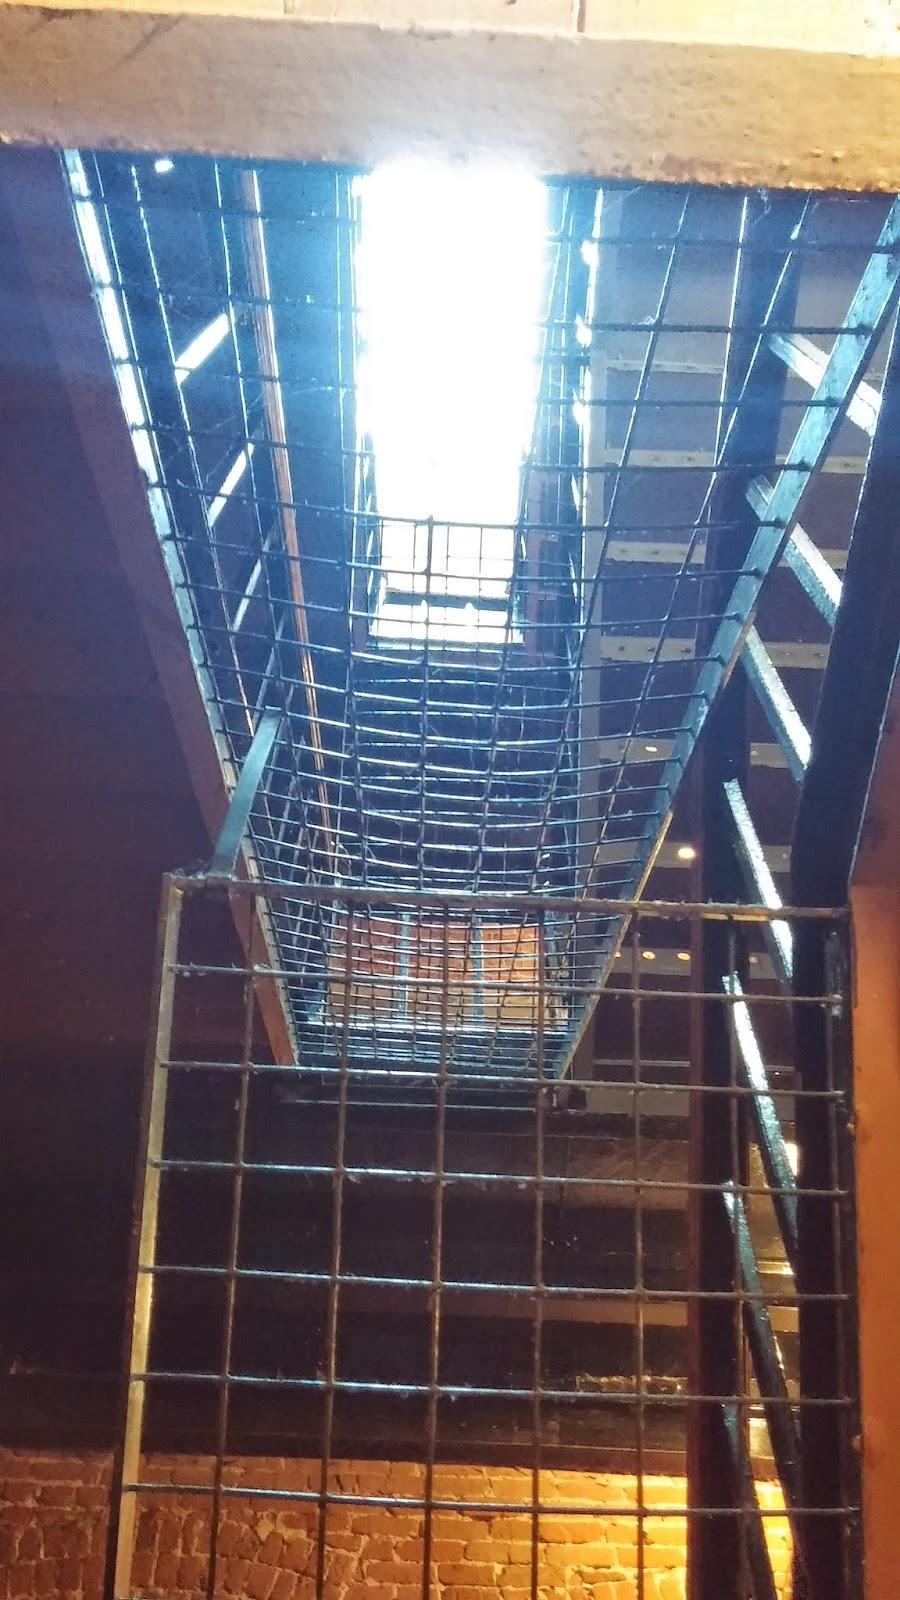 17 jours au canada et new york ottawa for Building sans fenetre new york